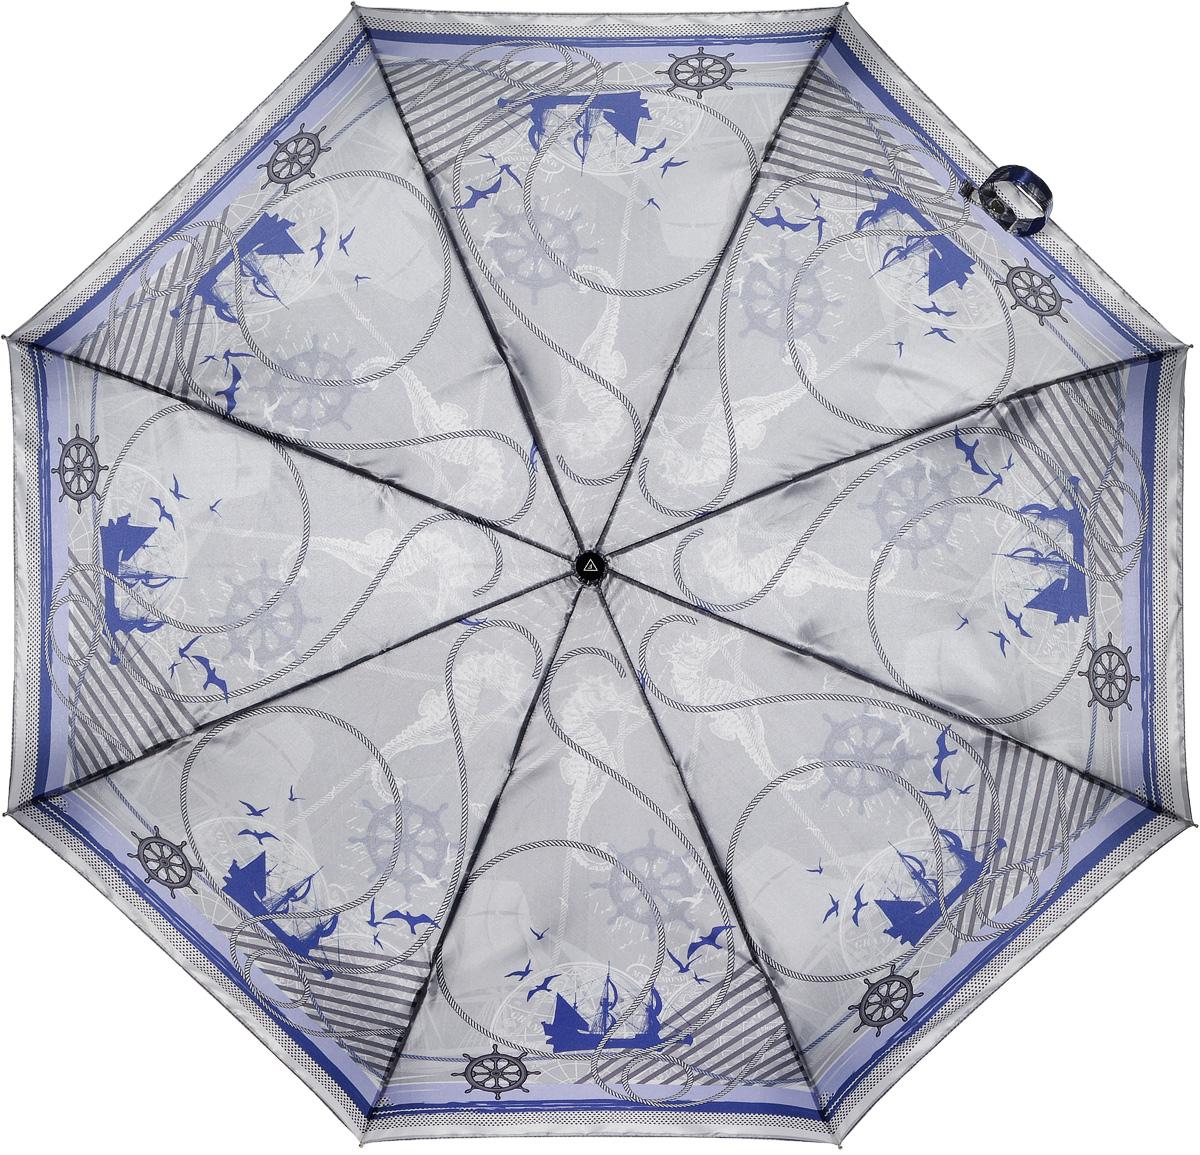 Зонт женский Fabretti, автомат, 3 сложения, цвет: серый, синий. L-16105-3